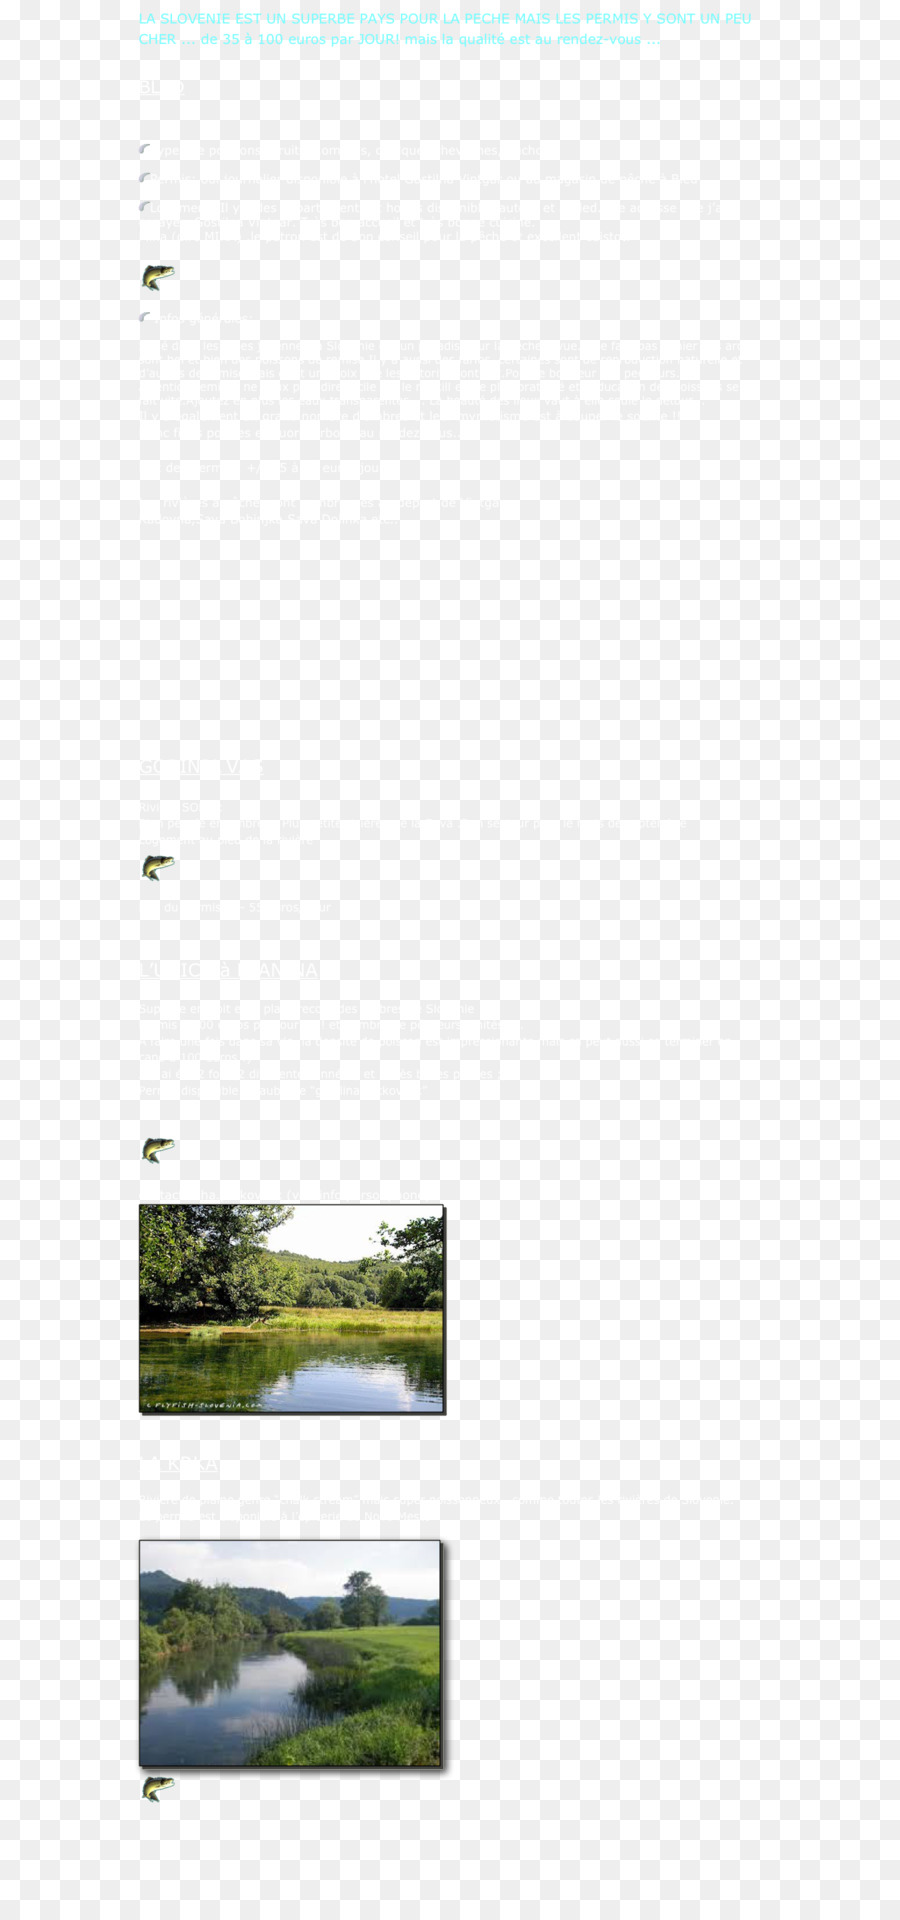 Gambar Ekosistem Padang Rumput : gambar, ekosistem, padang, rumput, Ekosistem,, Padang, Rumput,, Tanah, Gambar